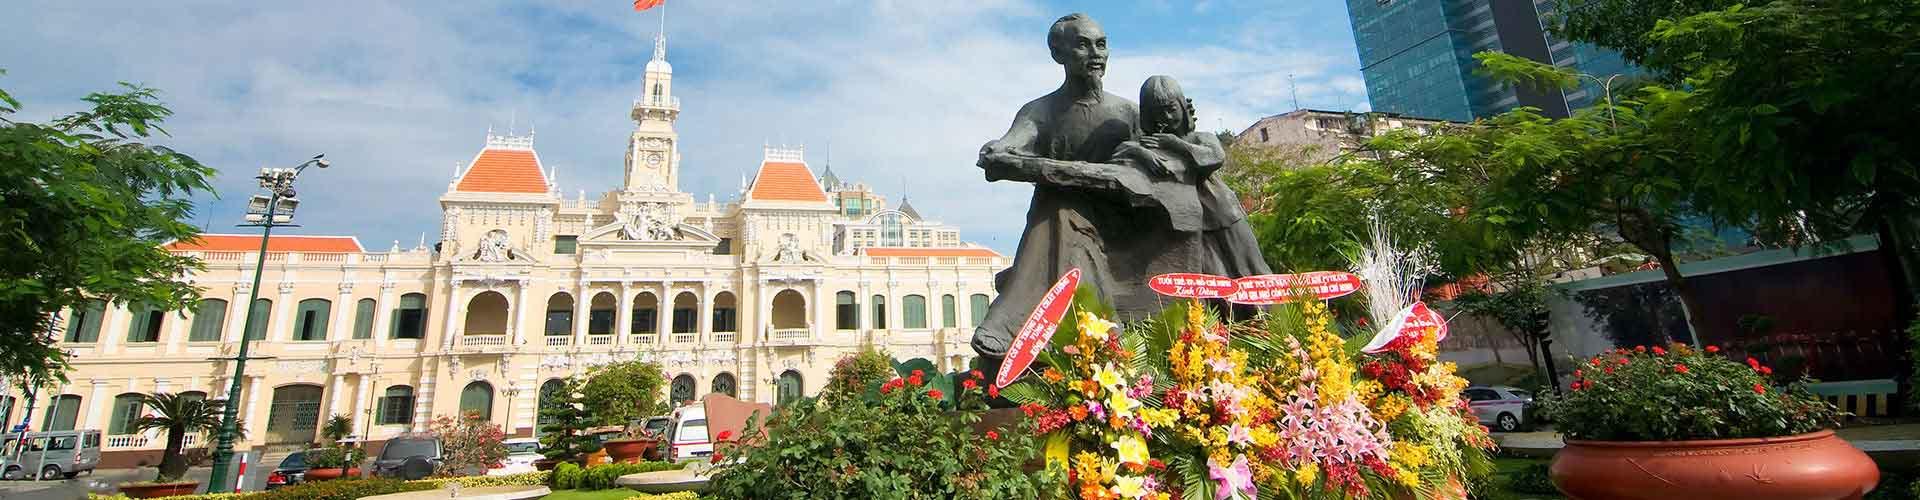 Ho Chi Minh City – Hostellit kohteessa Ho Chi Minh City. Ho Chi Minh City -karttoja, valokuvia ja arvosteluja kaikista Ho Chi Minh City -hostelleista.